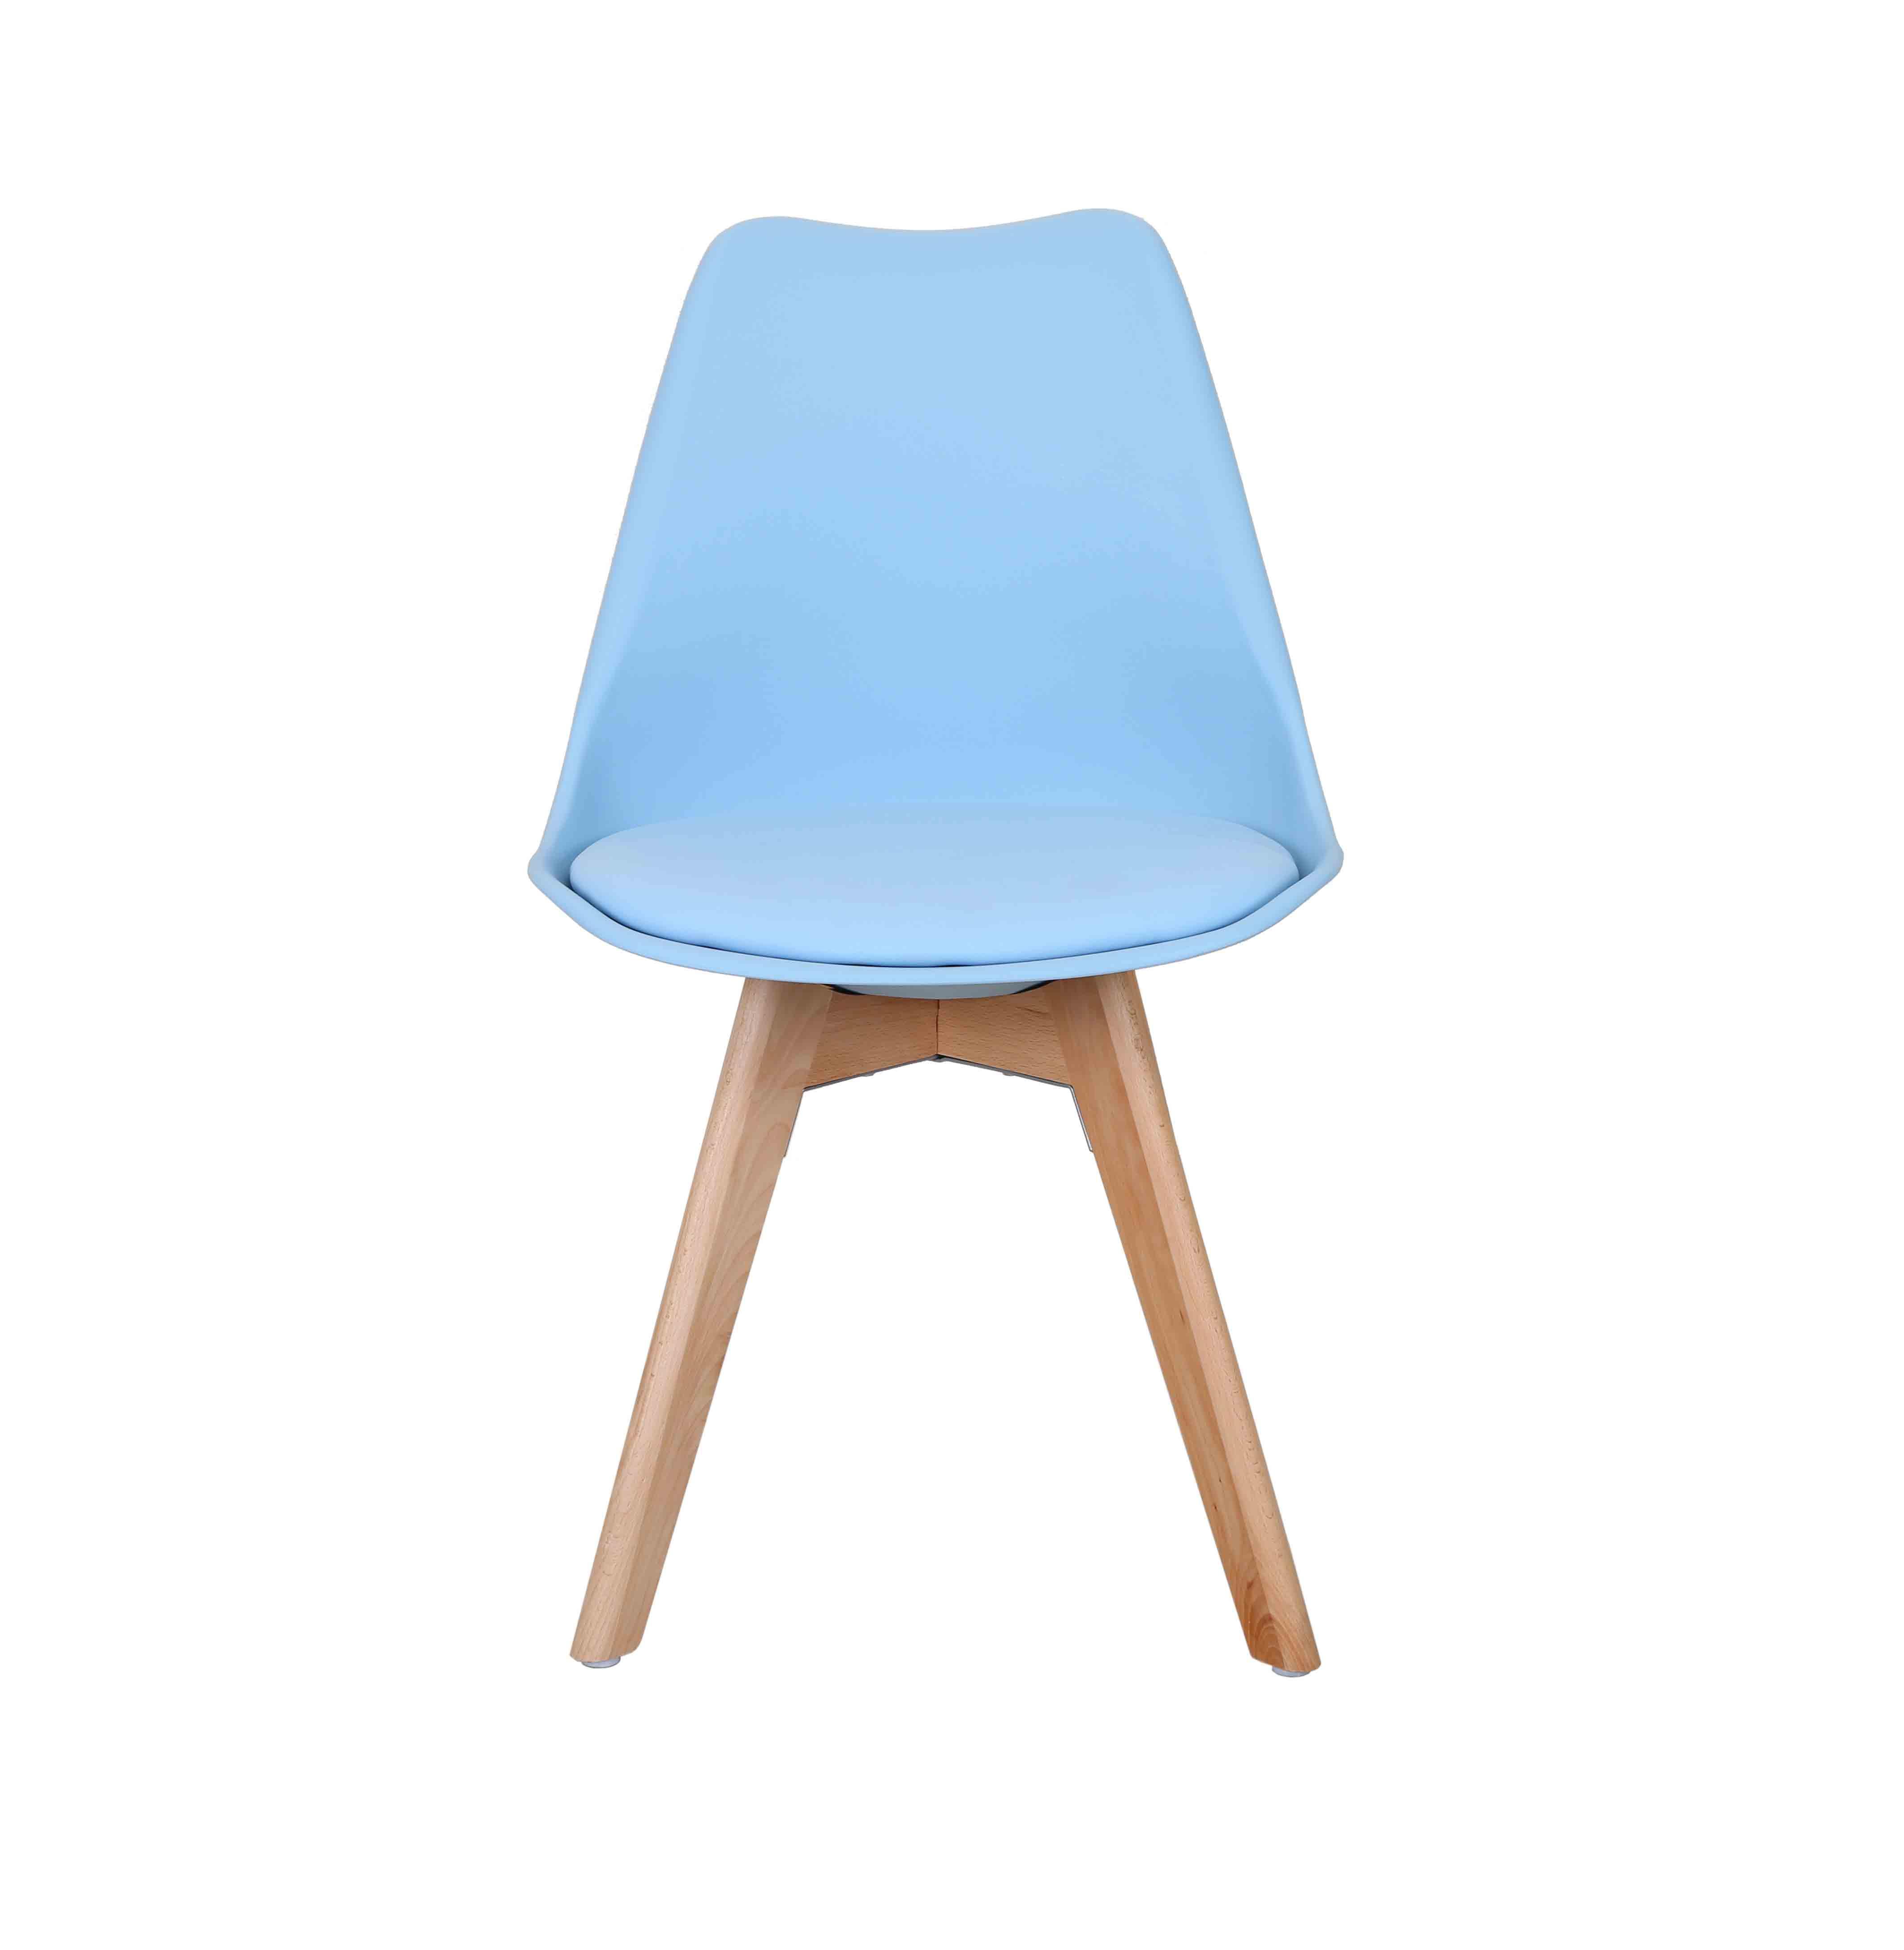 Simple stoel modern design college blauw with stoel blauw for Stoel kind ikea